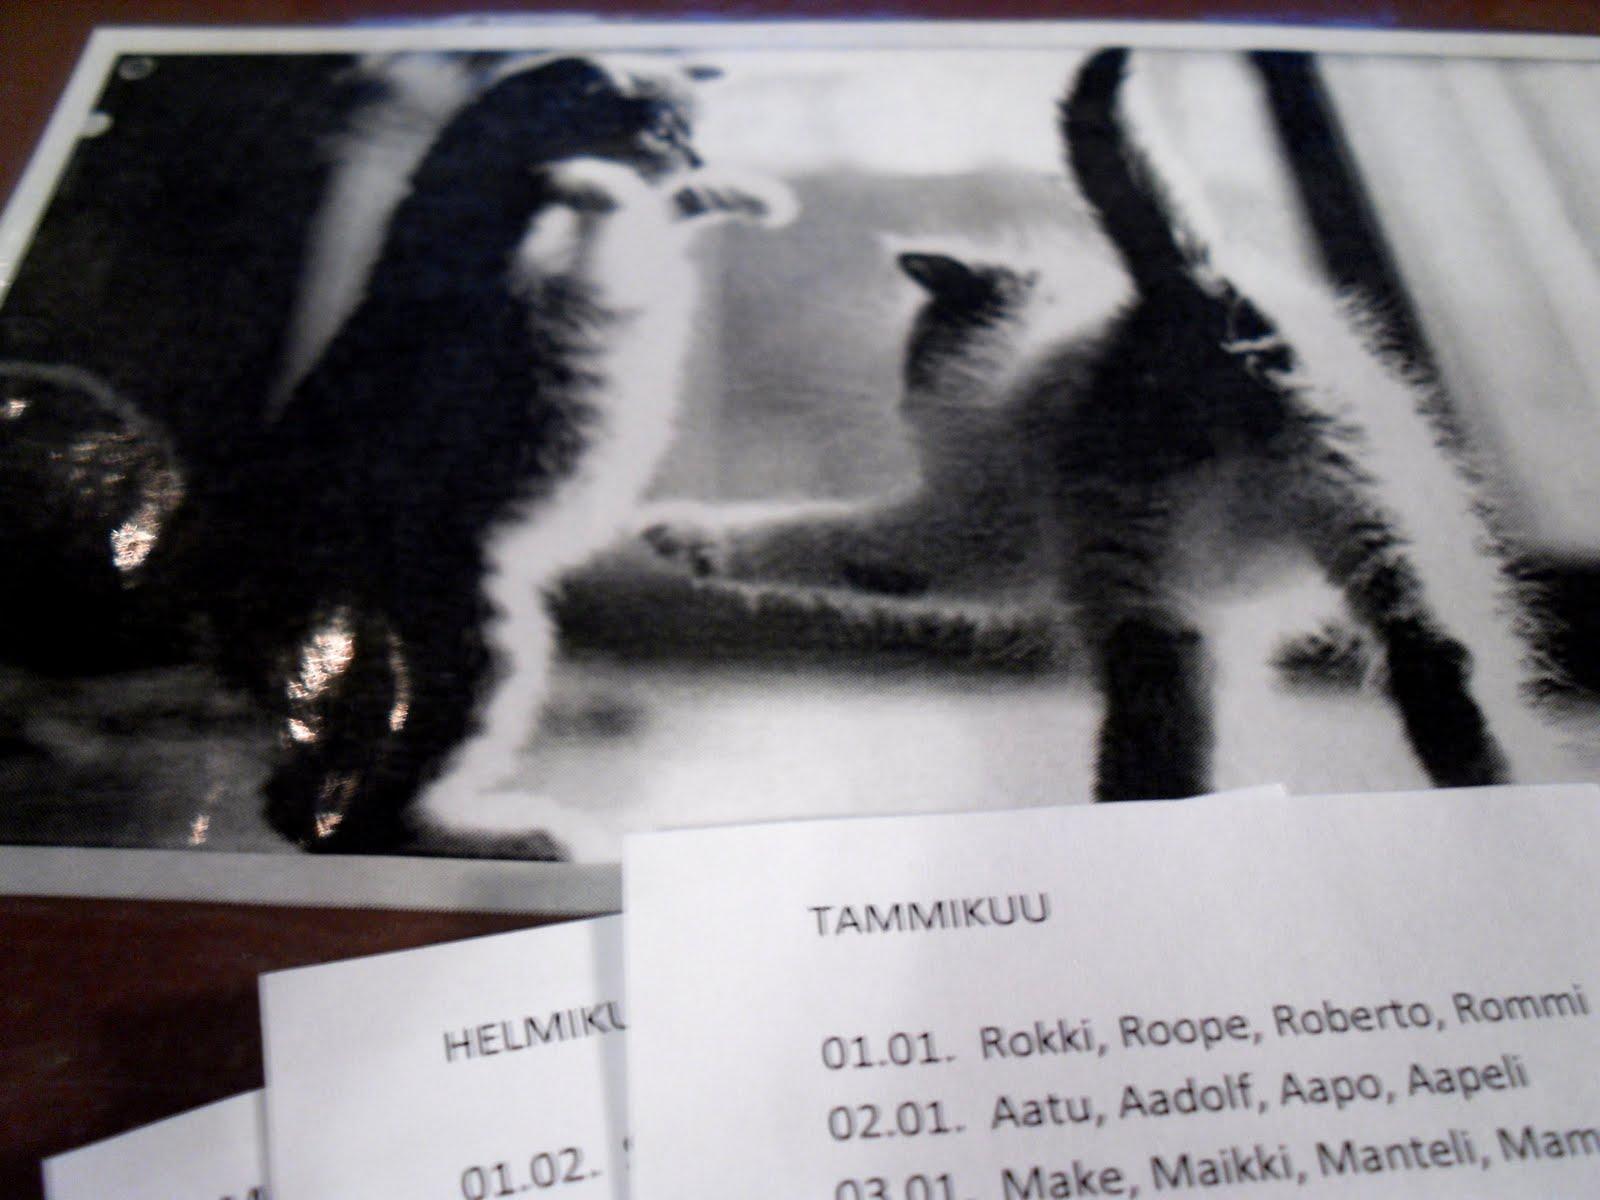 Kissojen Nimipäiväkalenteri